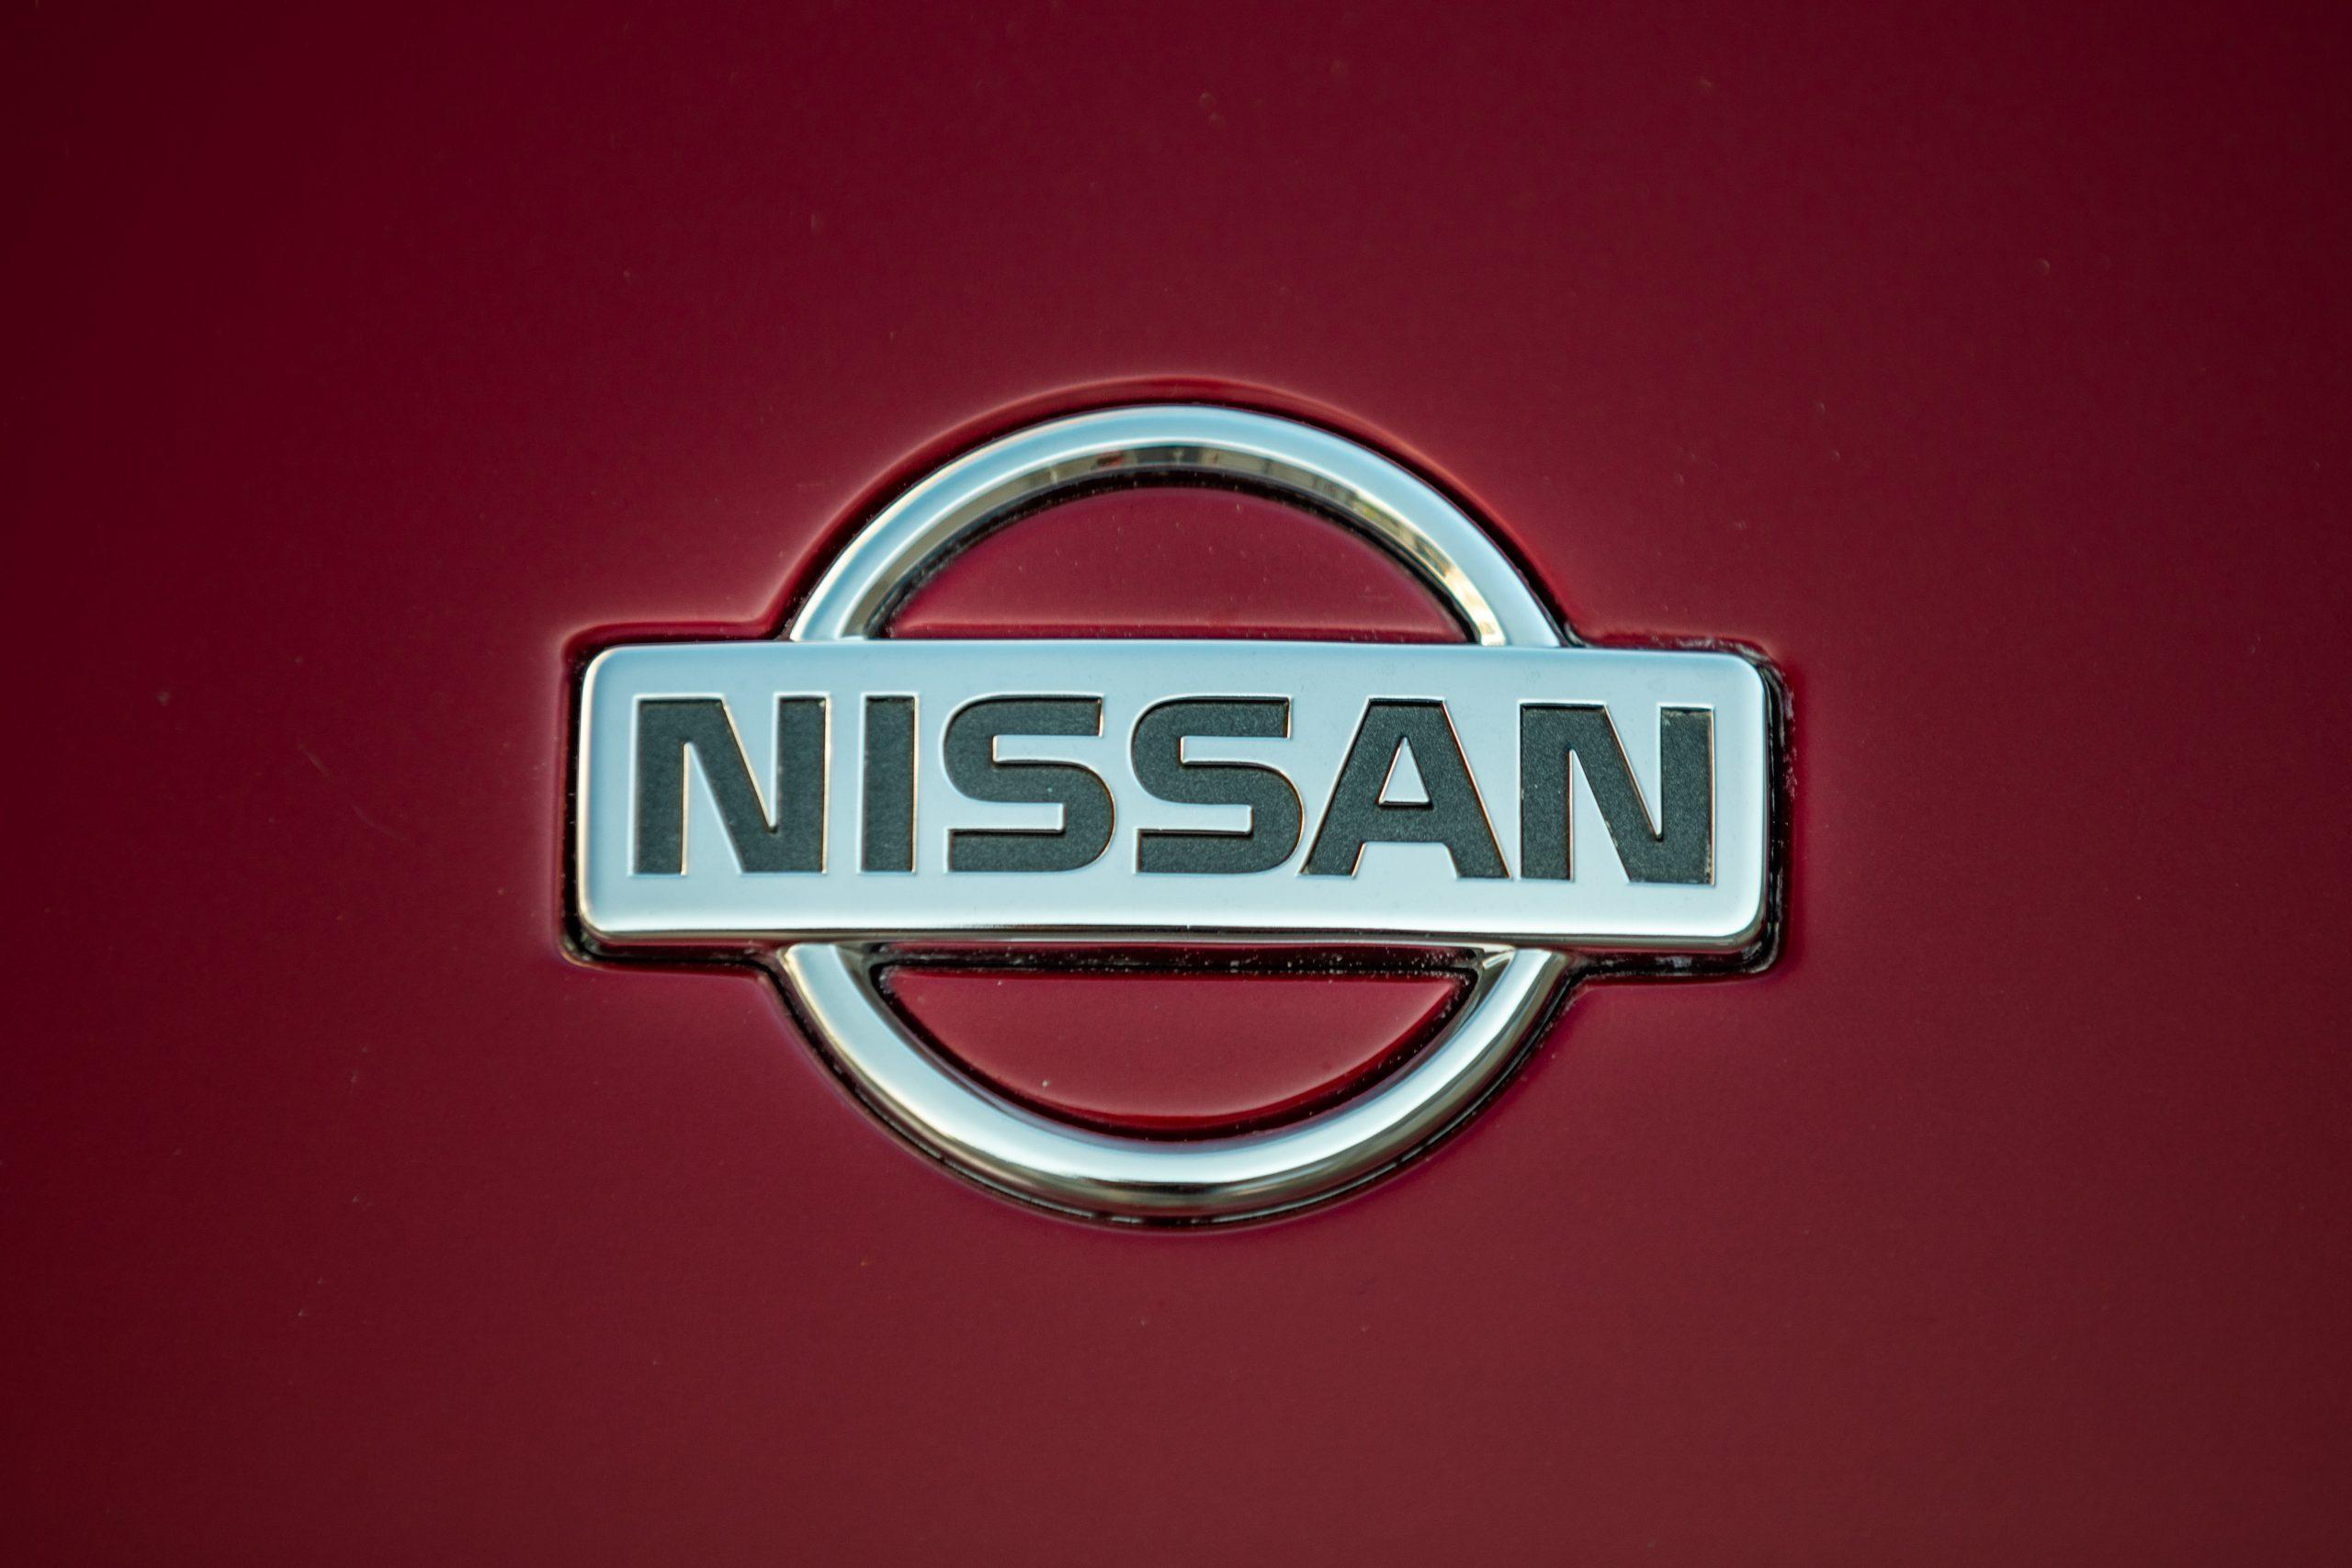 Nissan 300ZX badging